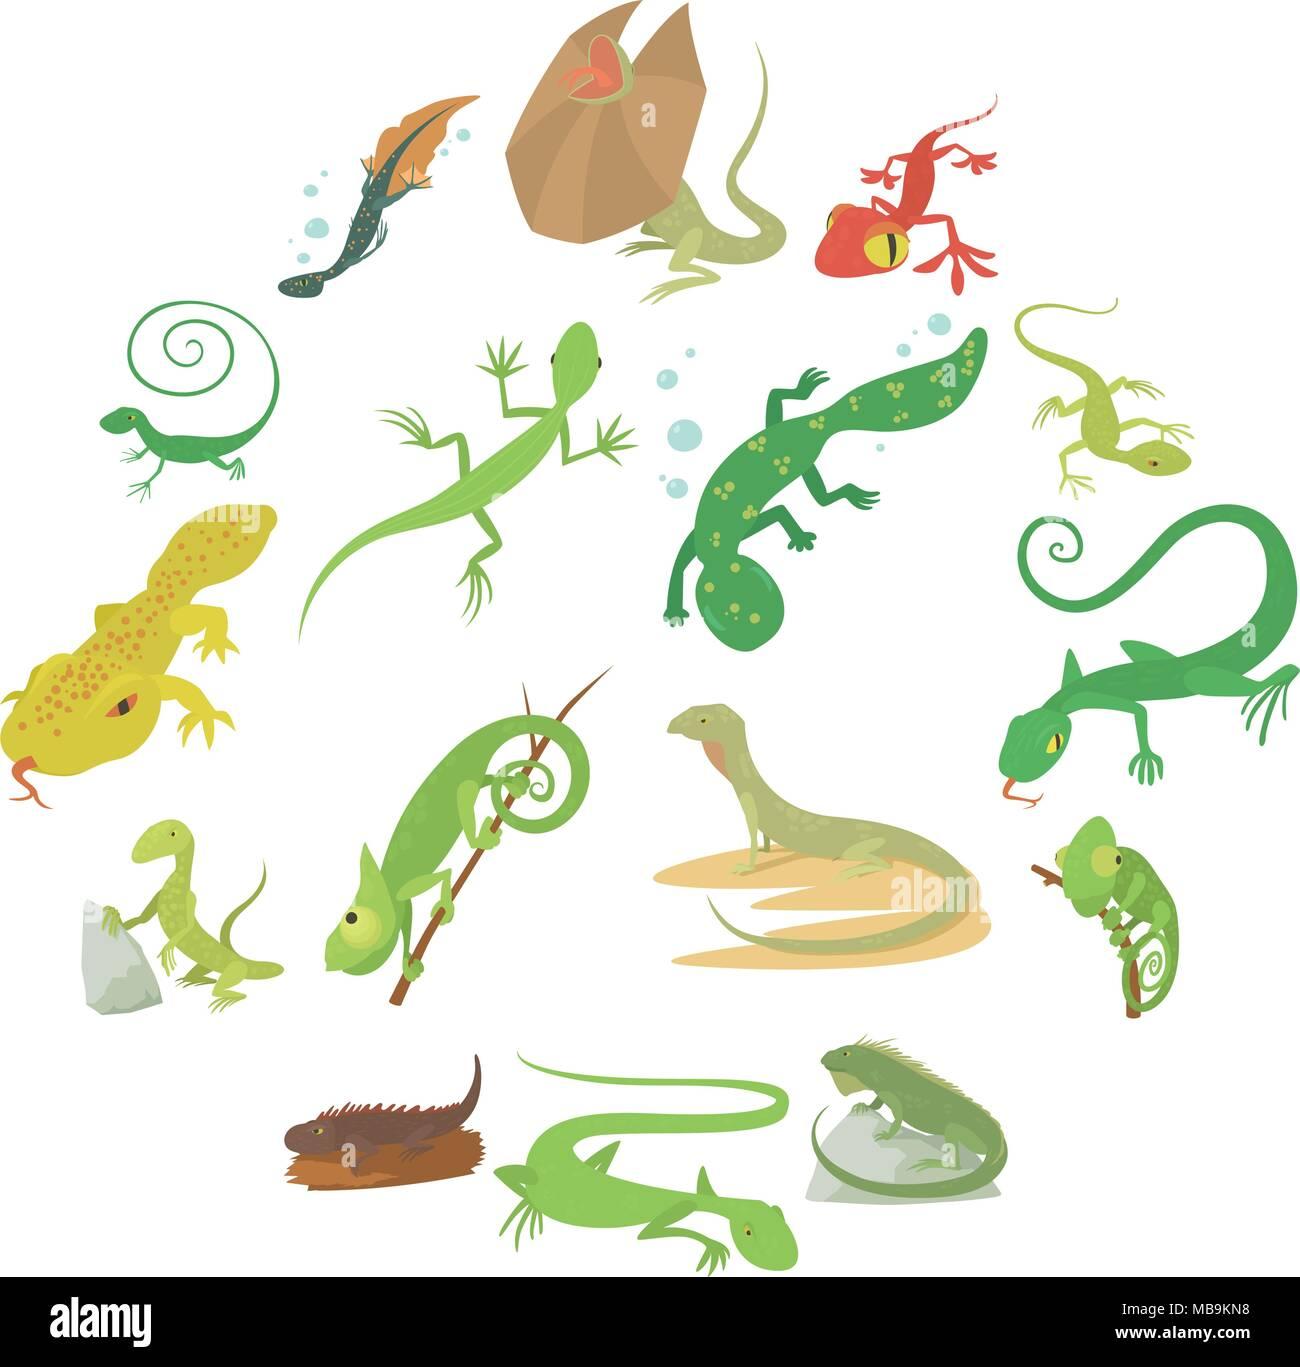 vector illustration animals cartoon